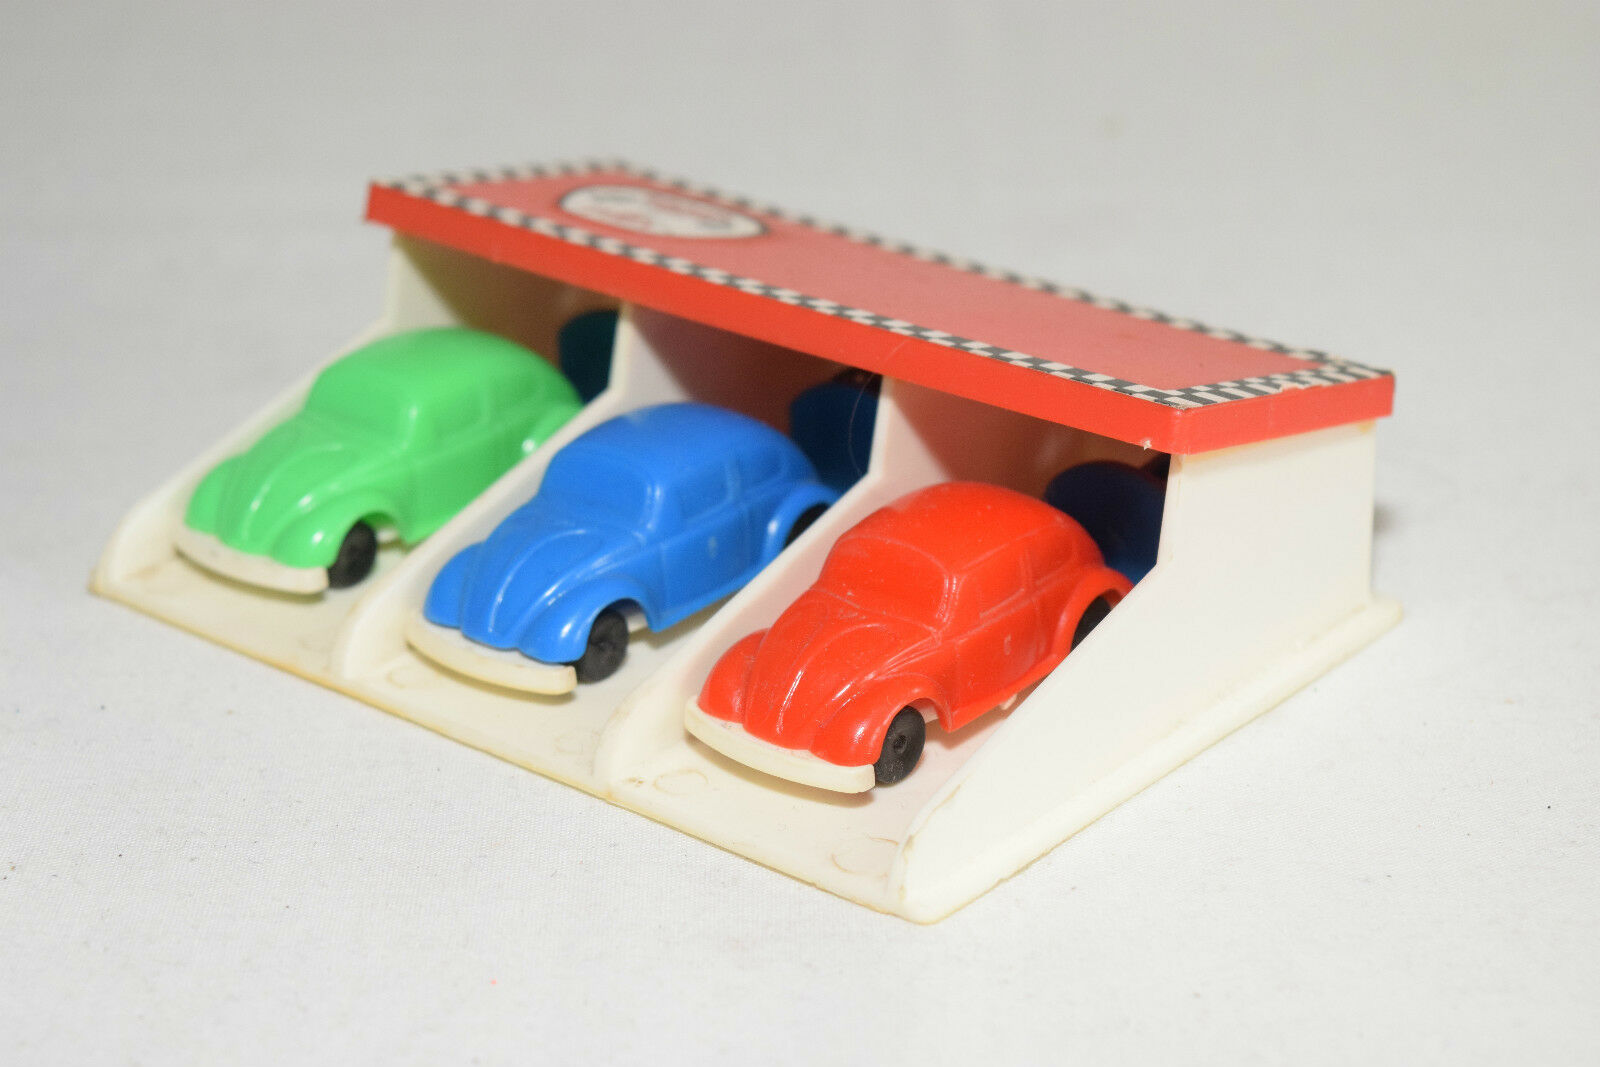 el estilo clásico SHAMBERS SPAIN PLASTIC PLASTIC PLASTIC VW VOLKSWAGEN BEETLE KAFER RACE SET NEAR MINT RARE SELTEN  saludable